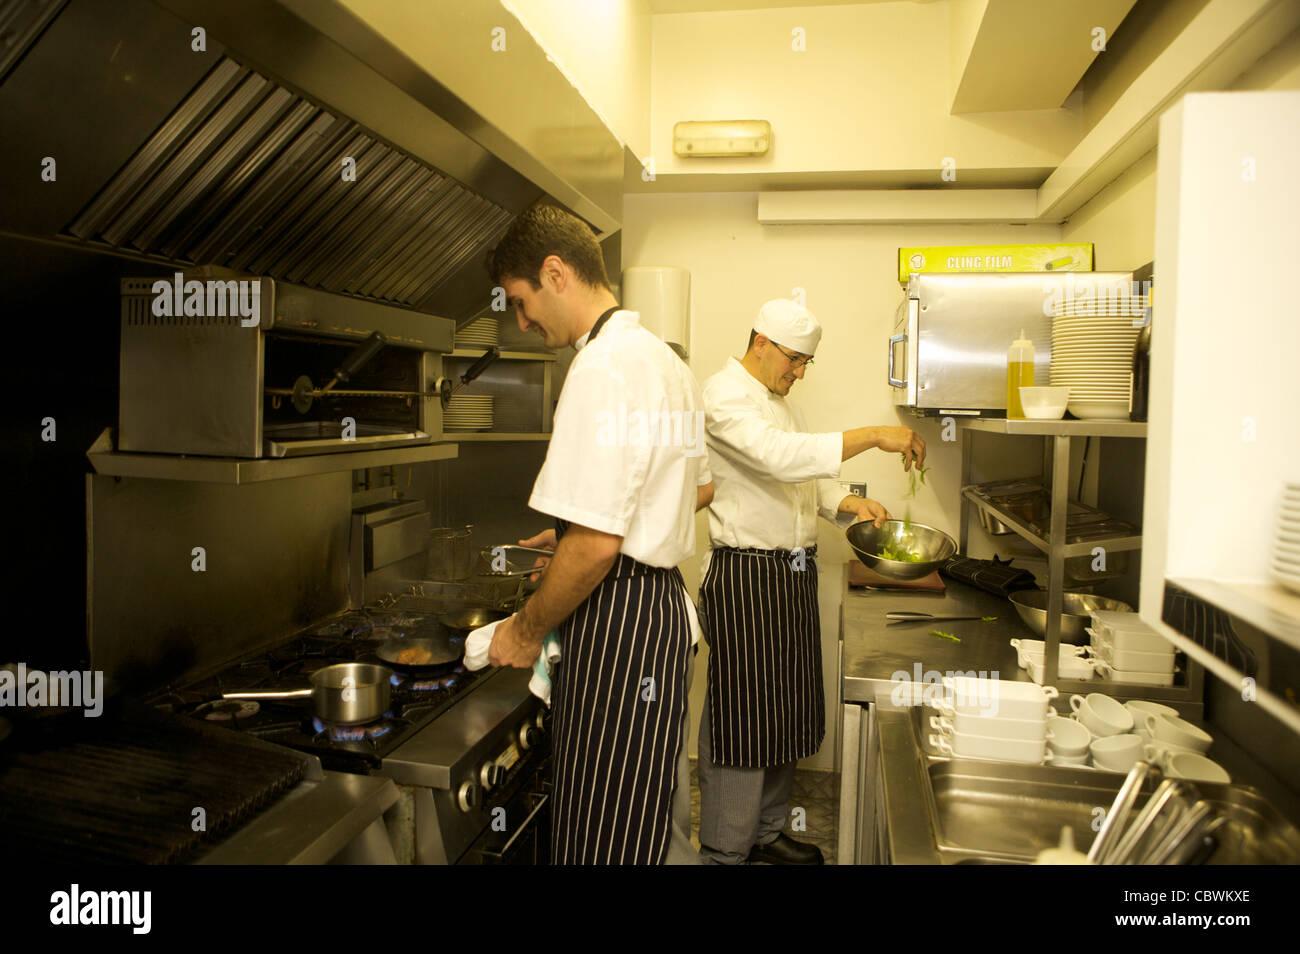 busy restaurant kitchen. Two Chefs Preparing Meals In A Busy Small Restaurant Kitchen